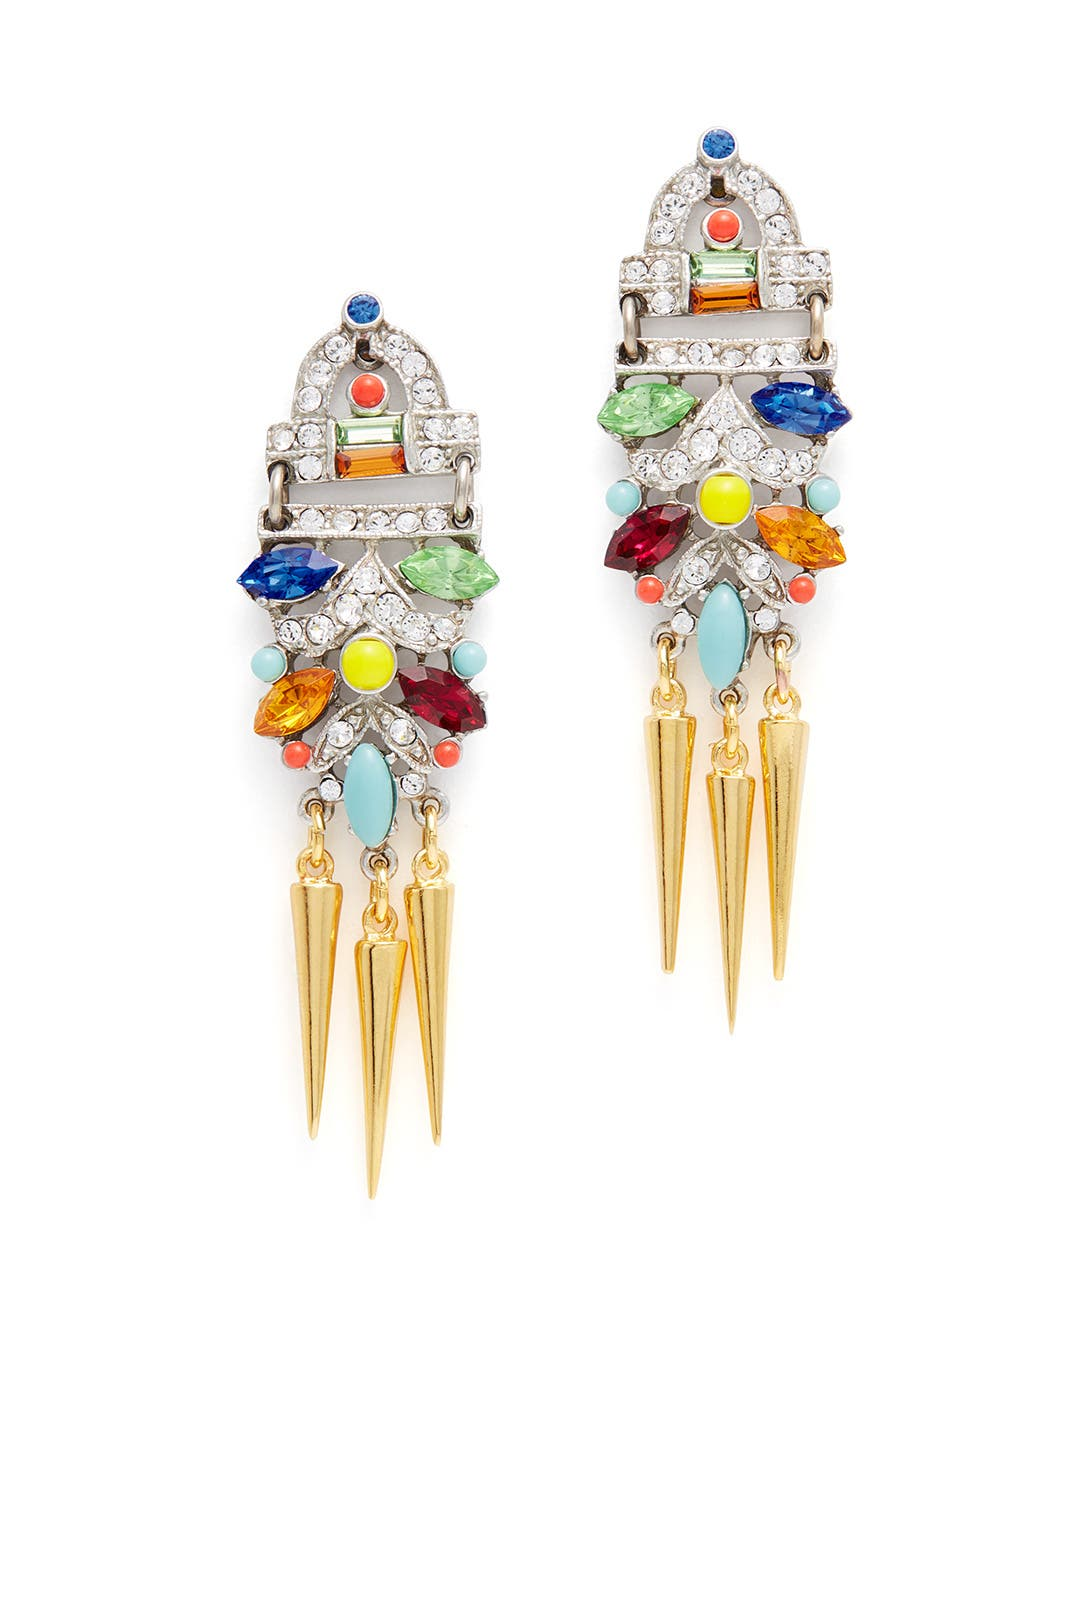 Benamun Bright Deco Spike Earrings